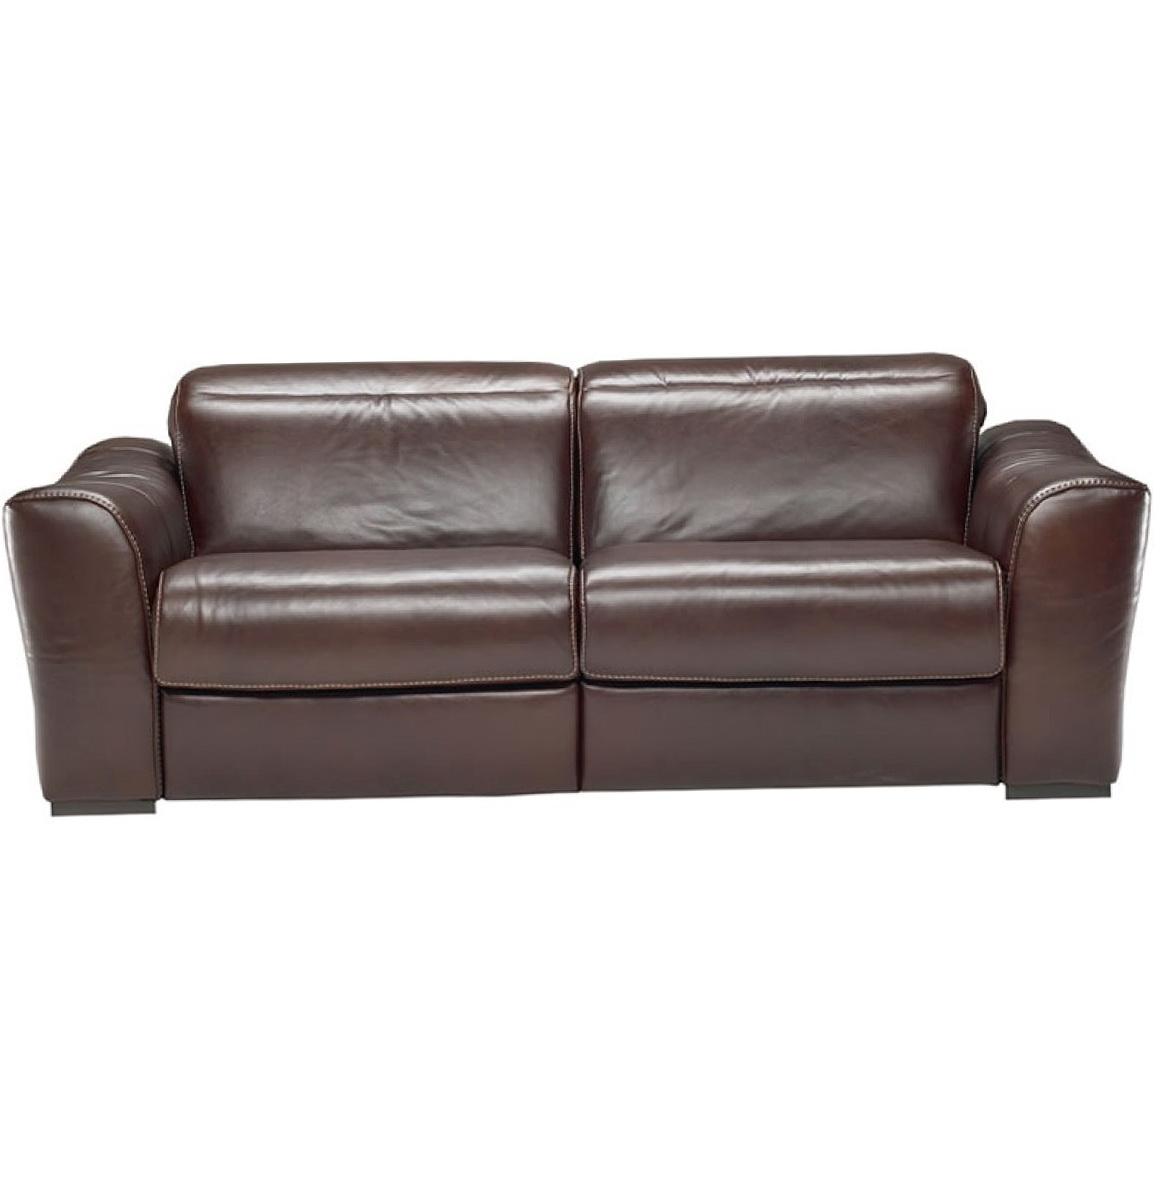 Natuzzi Leather Recliner Sofa